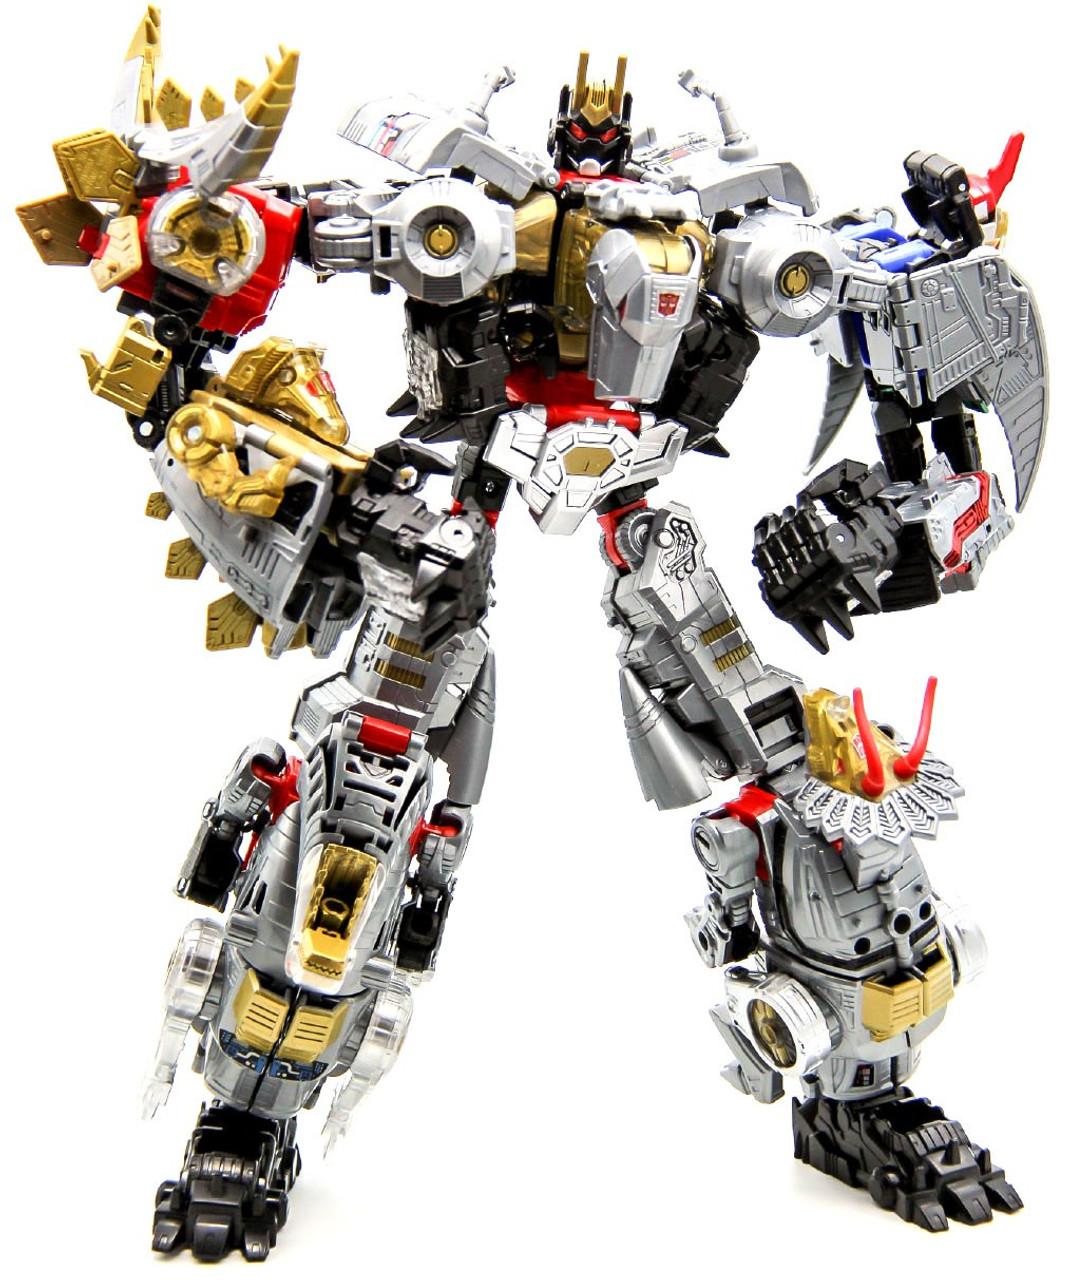 Transformers Generations Power of the Primes Volcanicus Action Figure [Grimlock, Sludge, Snarl, Swoop, Slug & Slash]